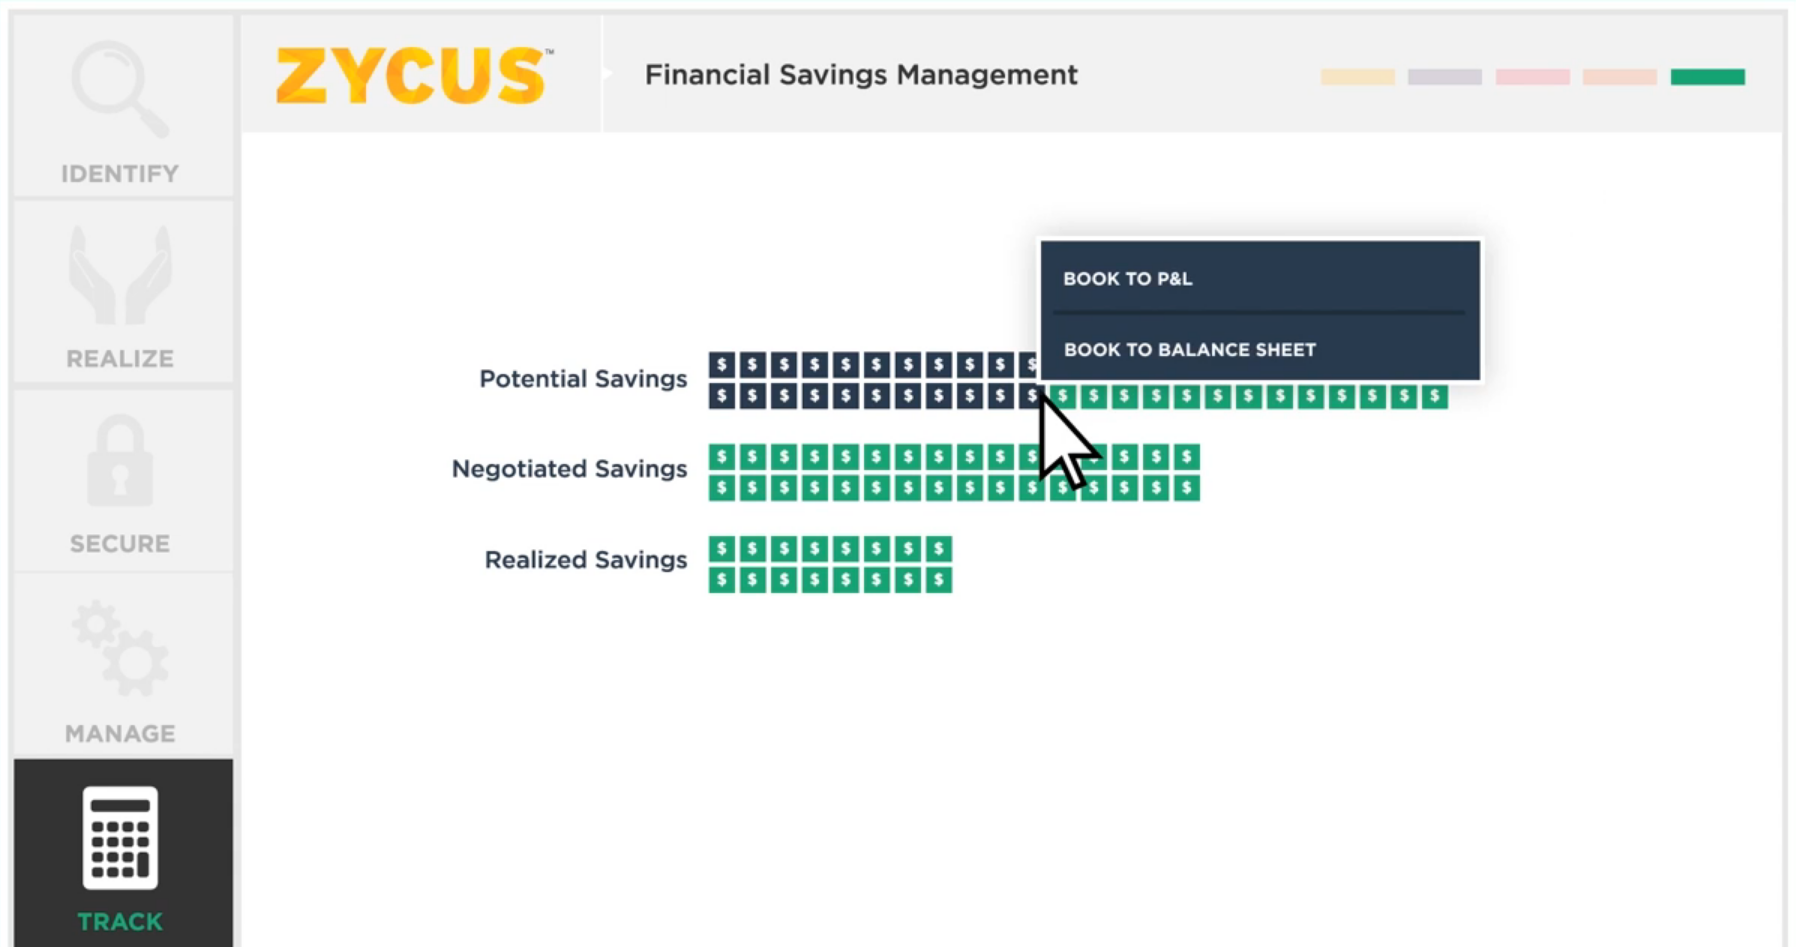 Financial savings management